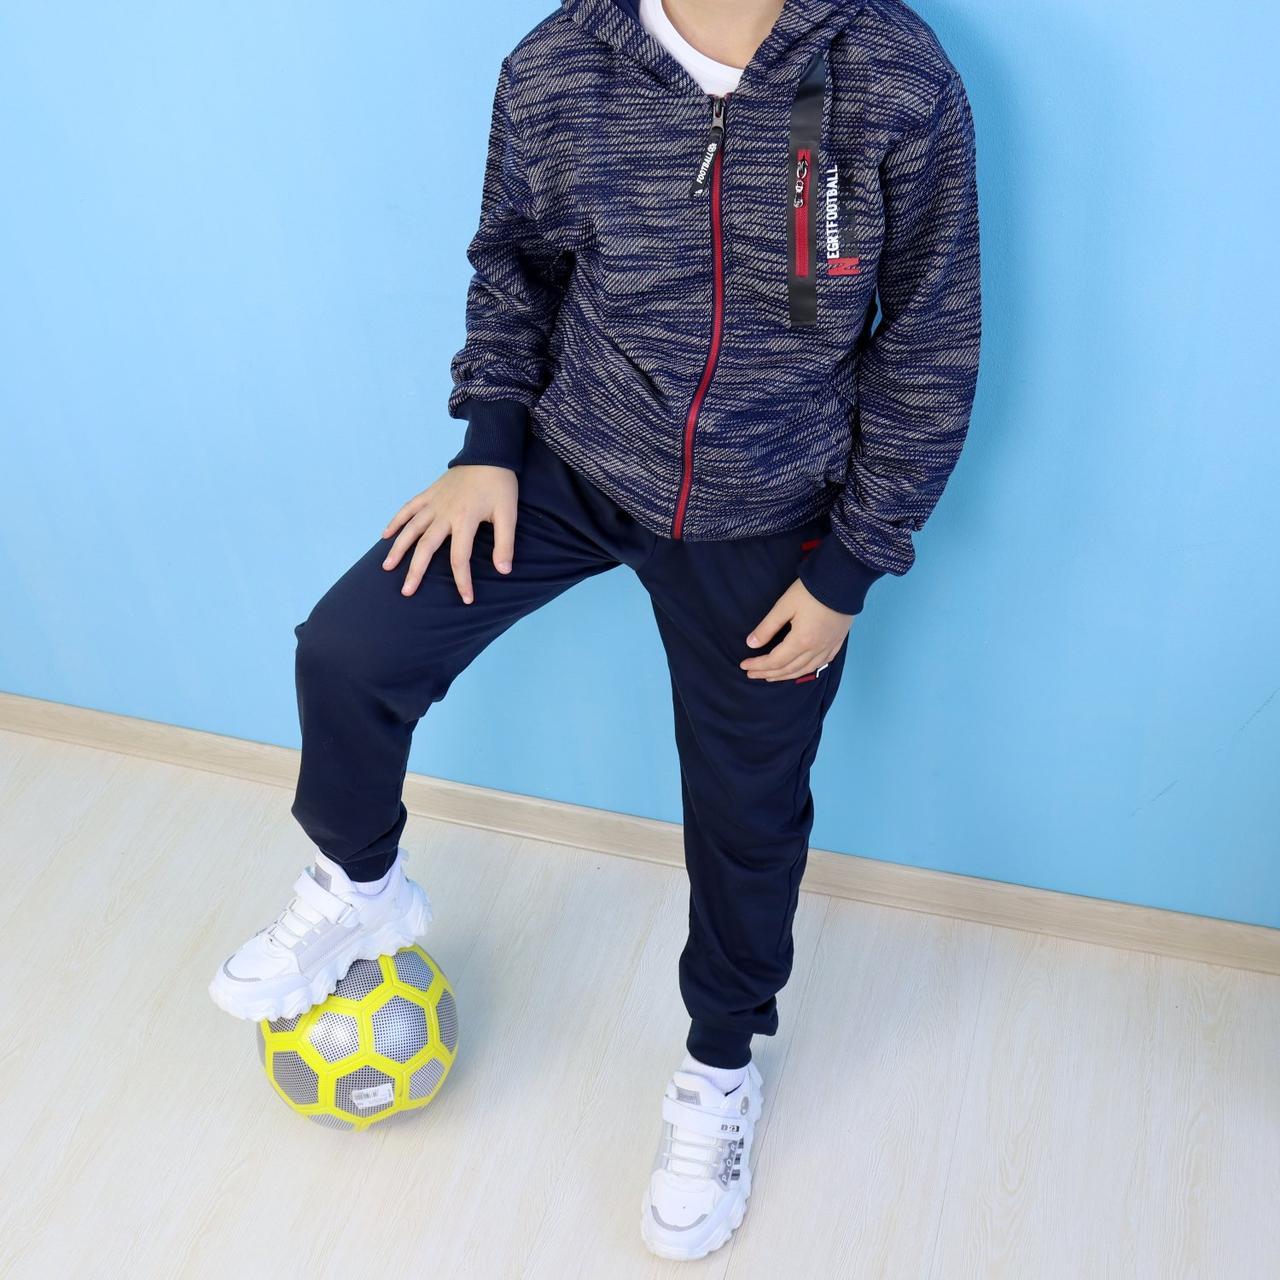 Спортивный костюм для мальчика меланж синий тм Sincere размер 134,146,152,158 см